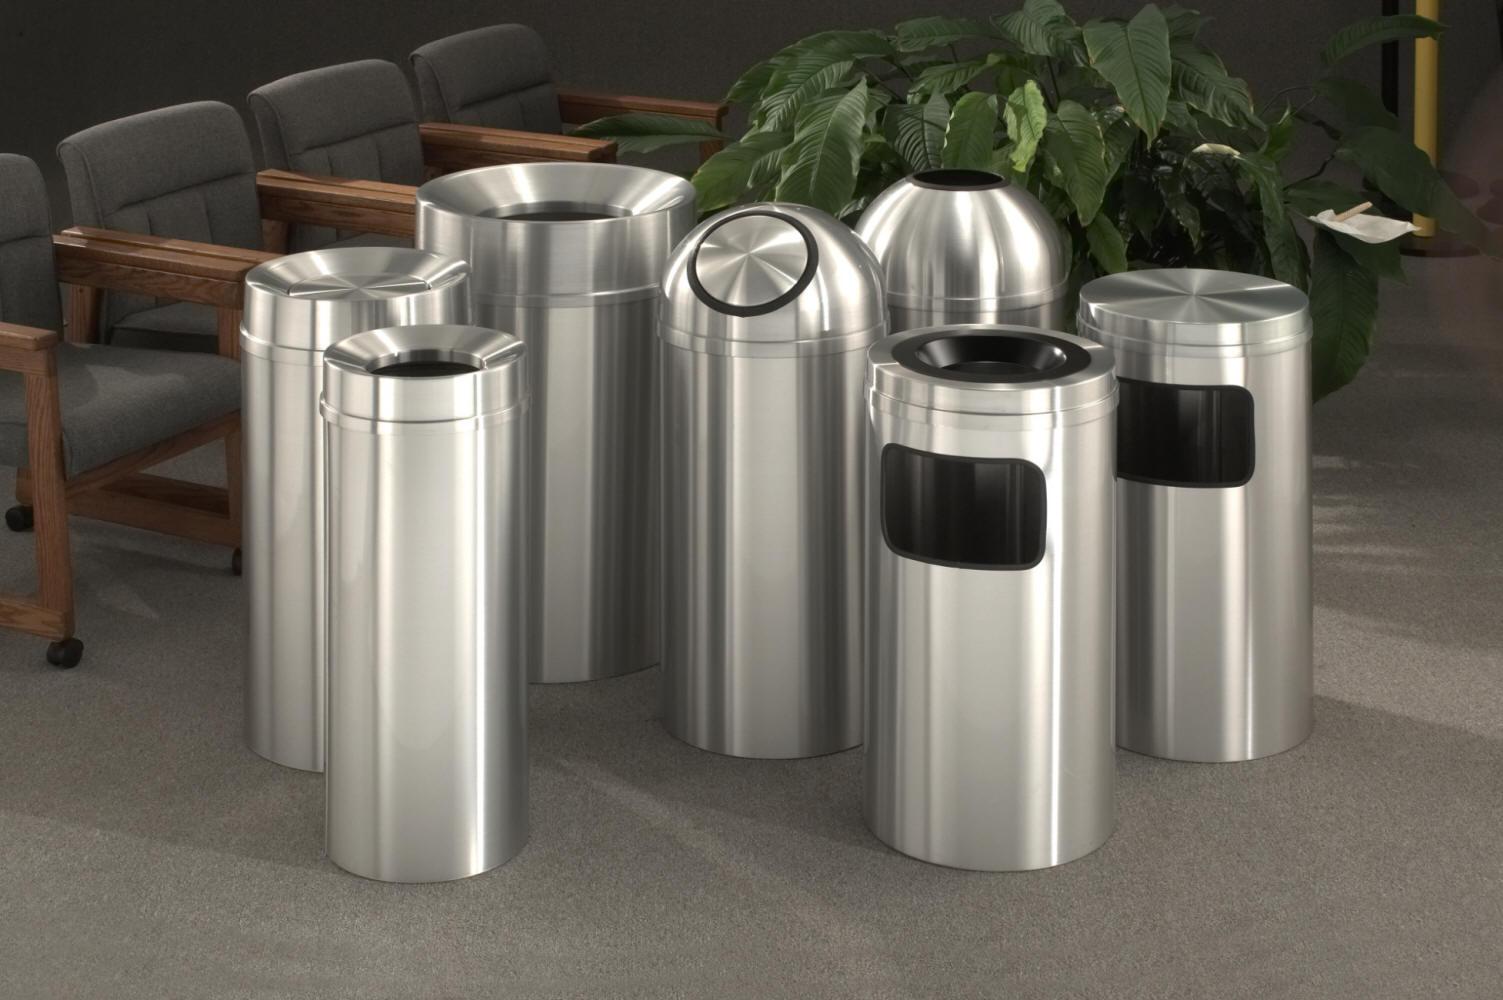 glaro-new-yorker-receptacles.jpg